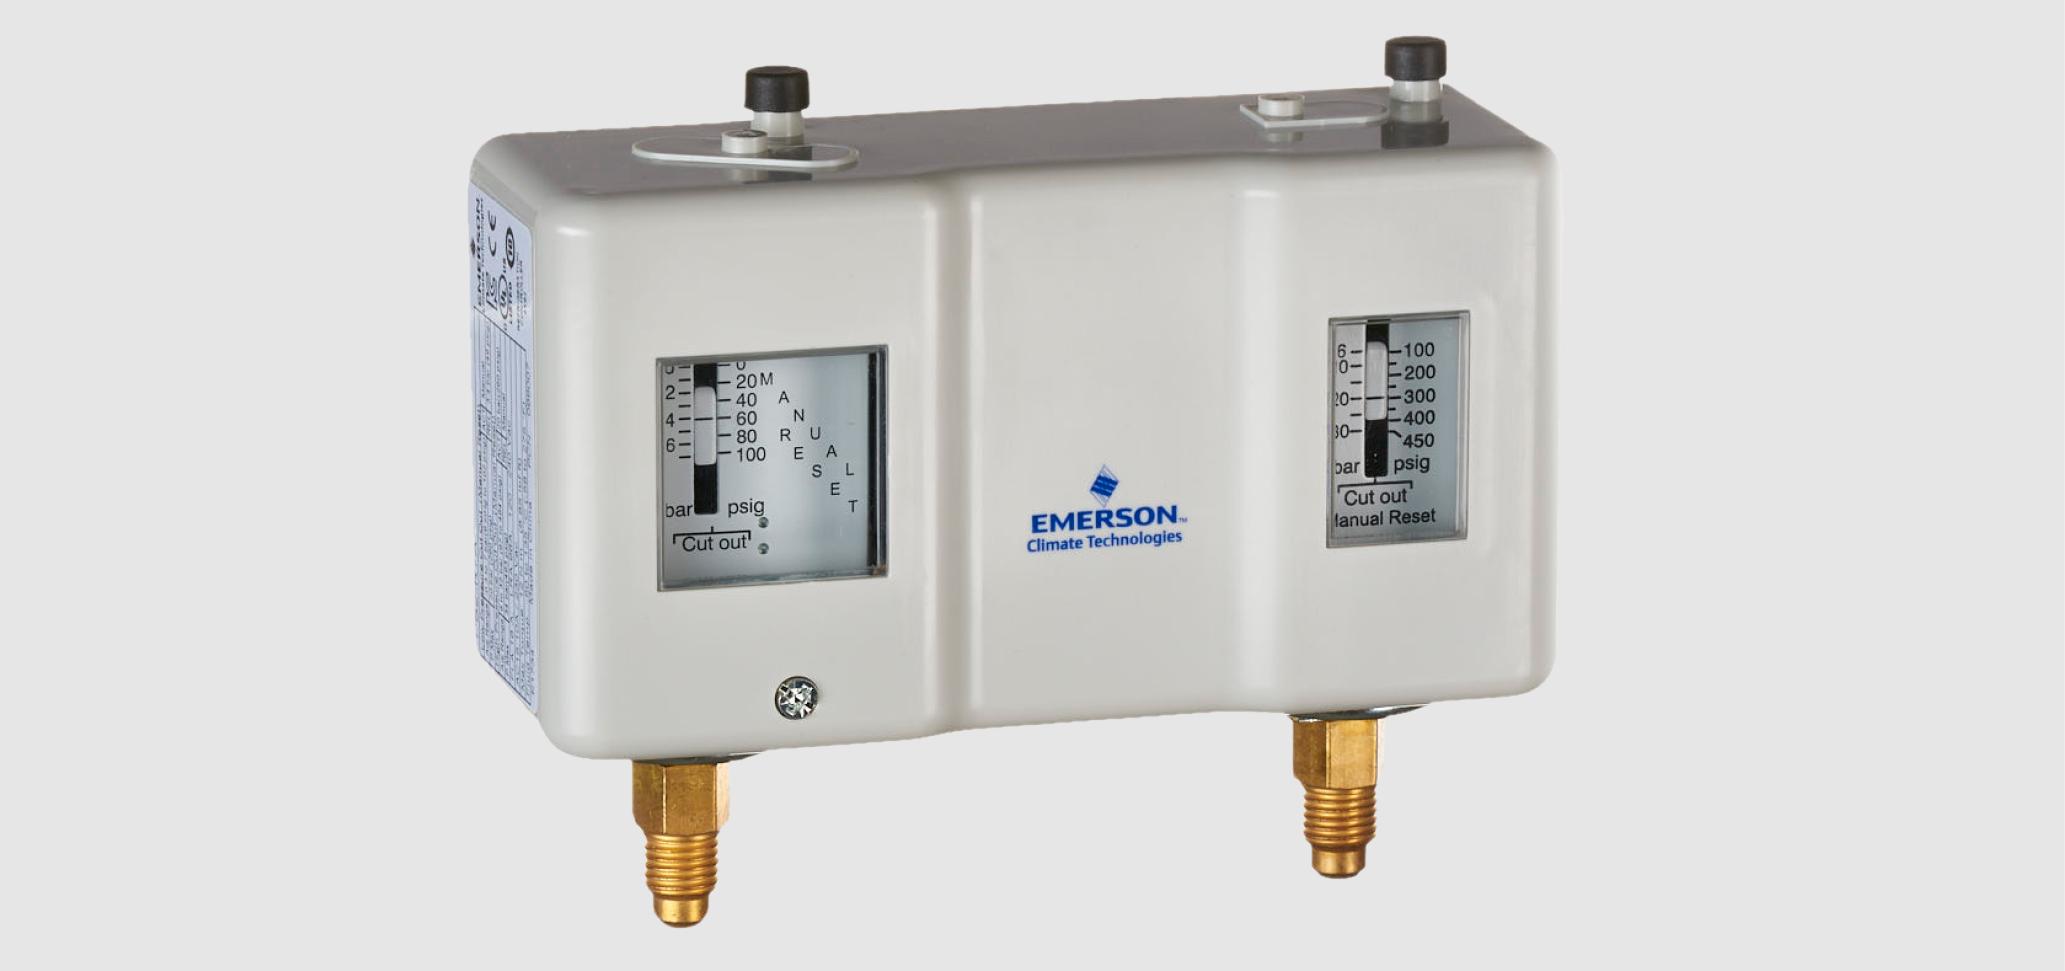 Actrol Emerson valves refrigeration